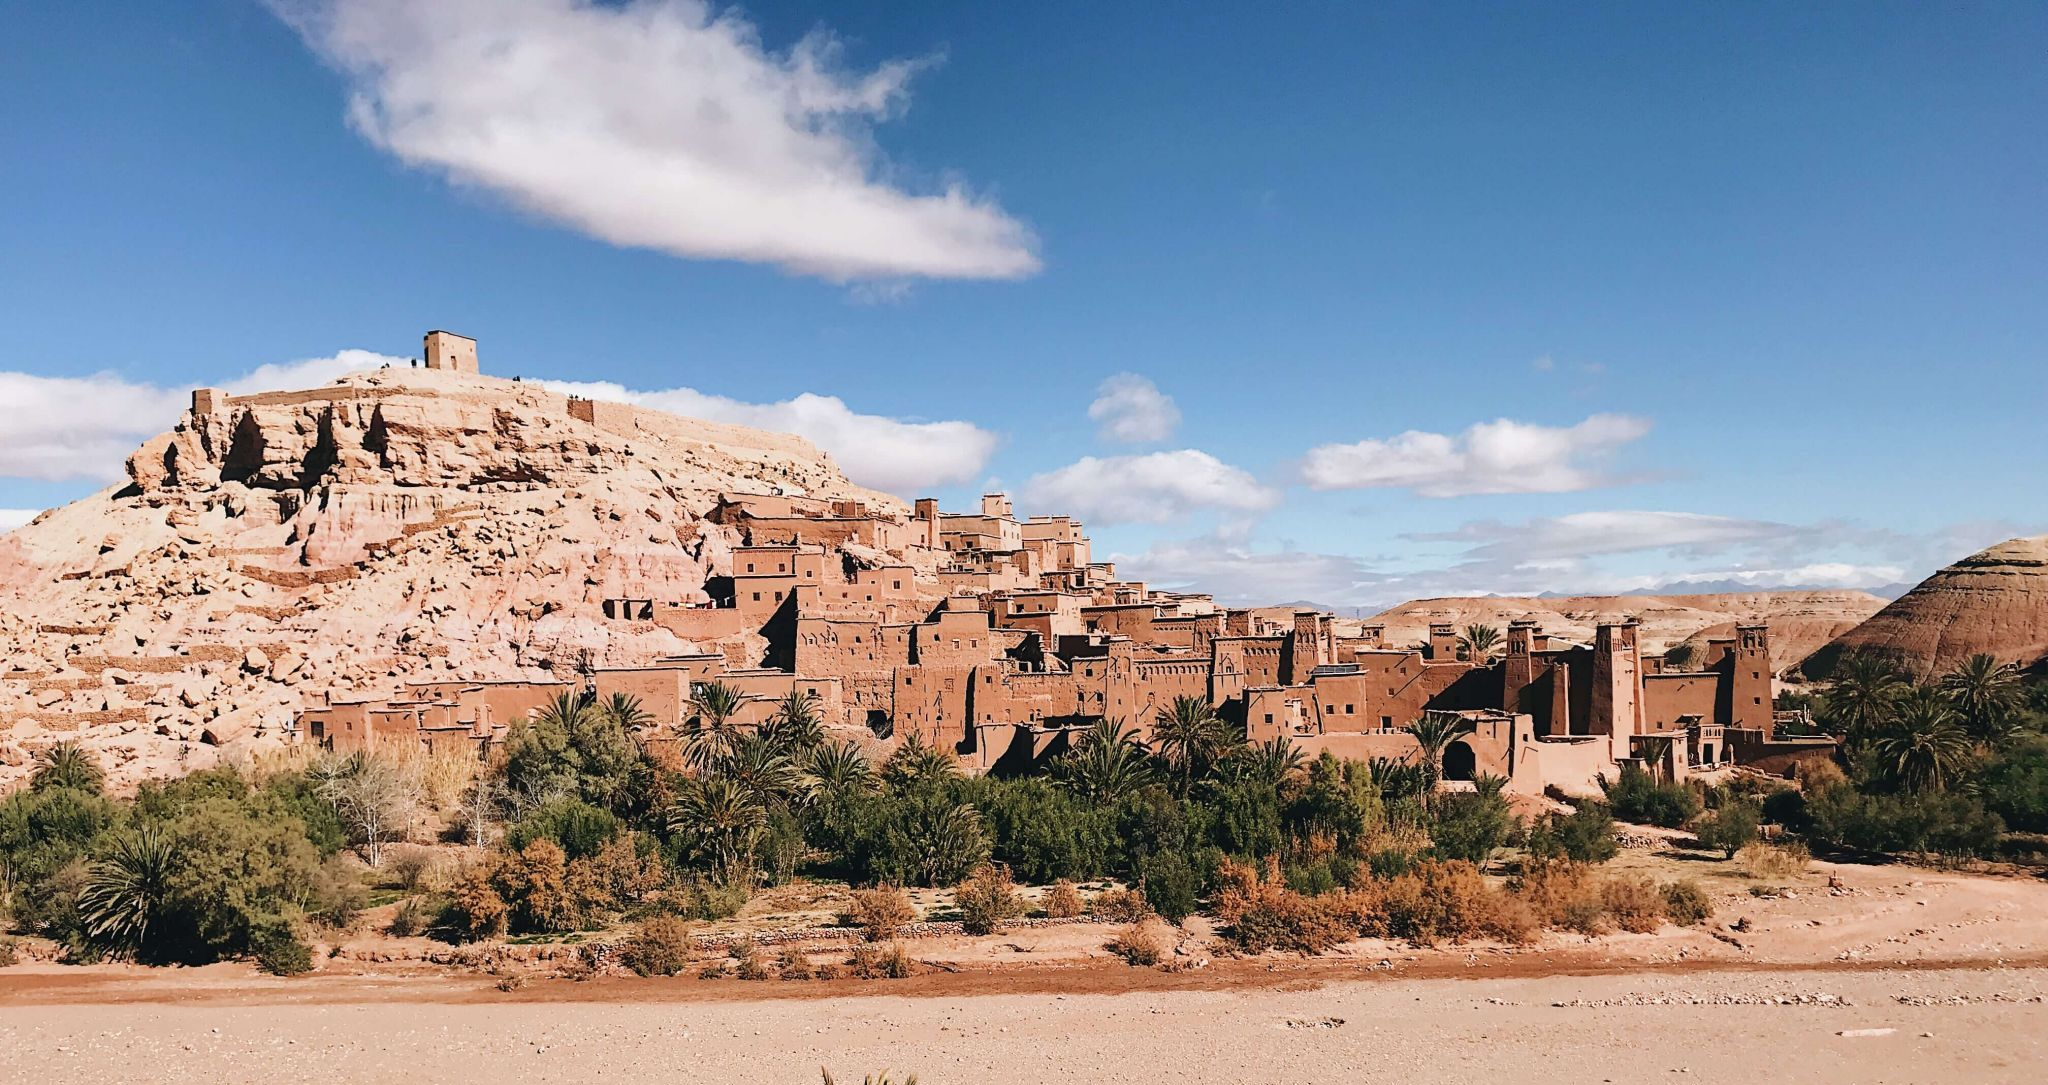 Ait Ben Haddou Game of Thrones Morocco 2